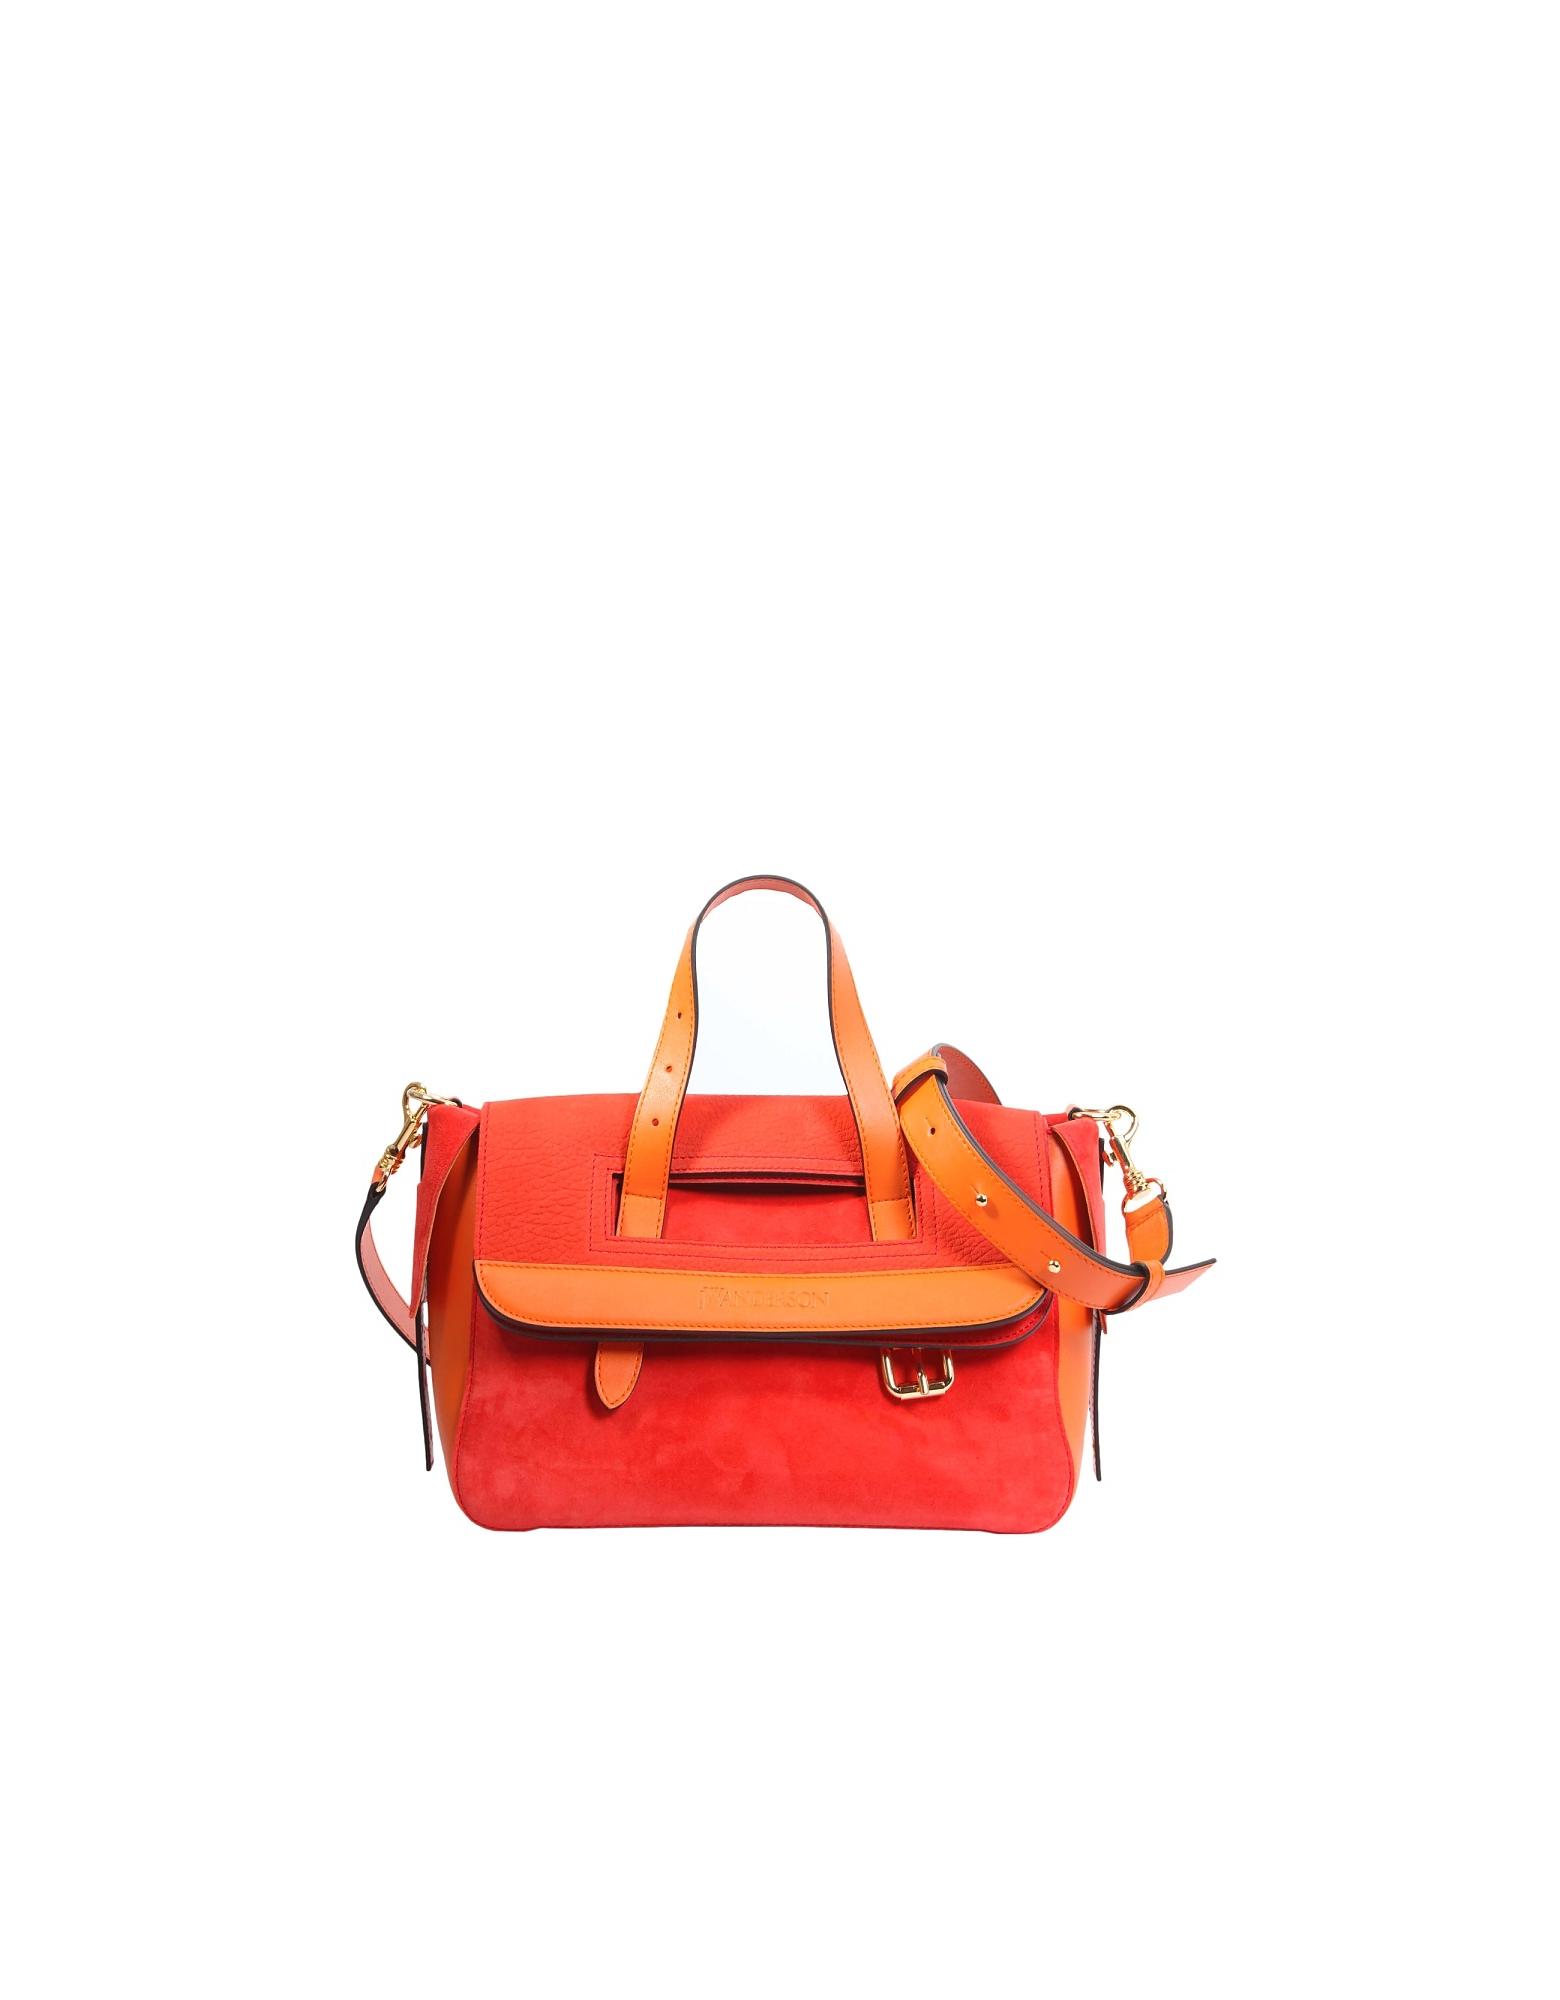 Jw Anderson Tool Mini Bag In Orange